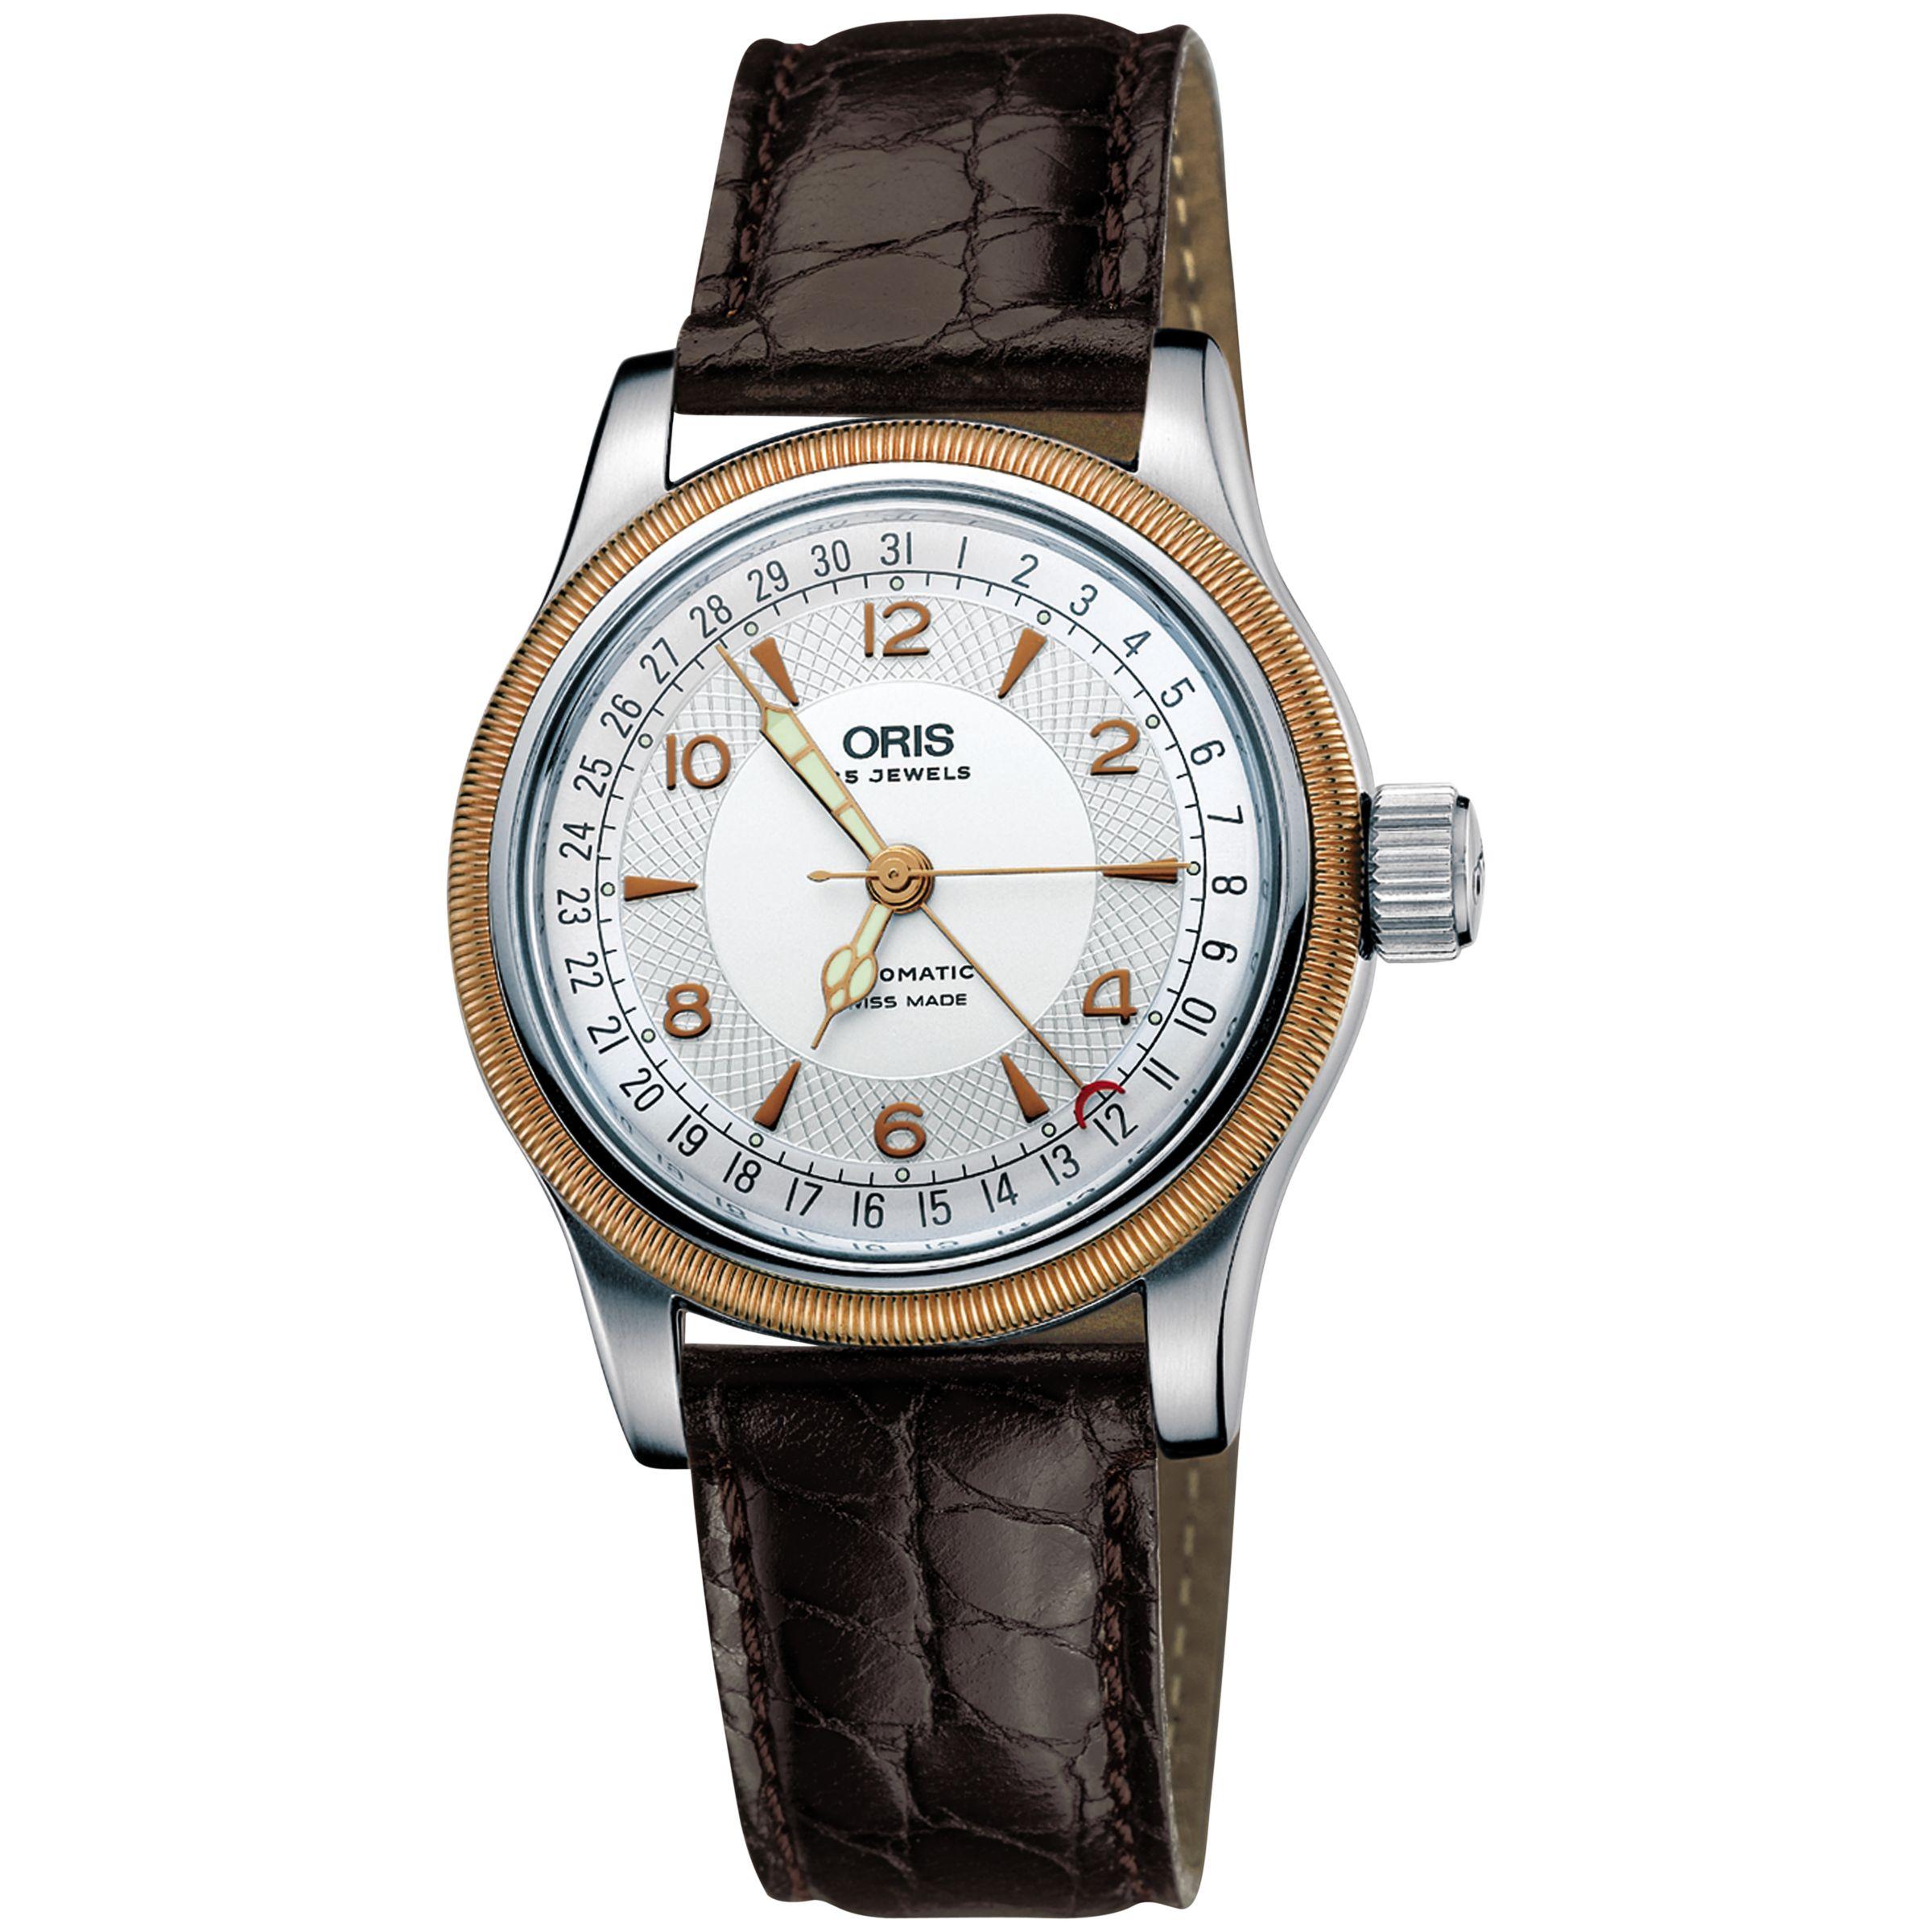 Oris Oris 0175475434361LS Men's Big Crown Leather Strap Watch, Brown/White